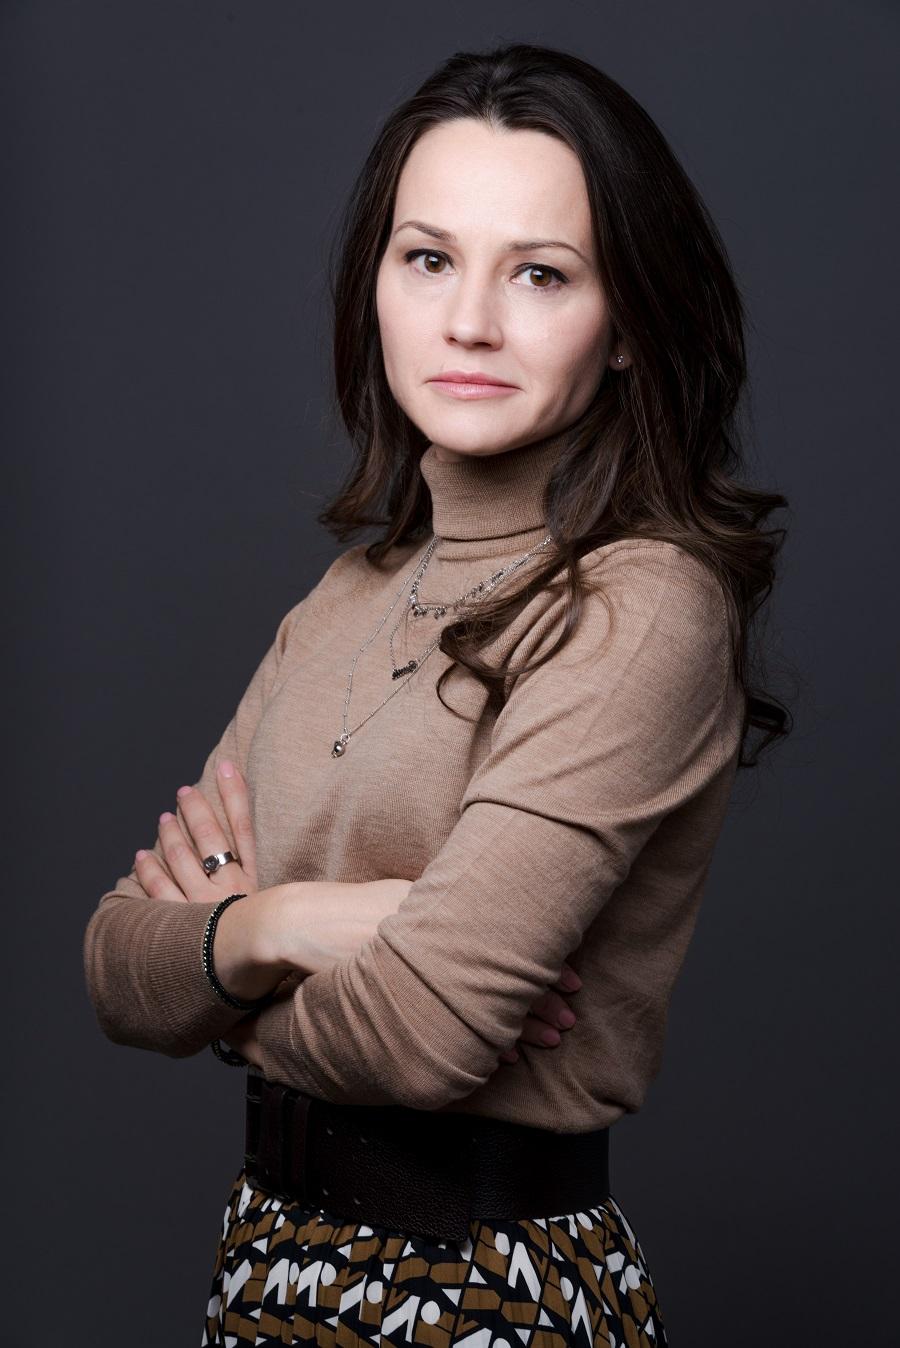 Полина Угрюмова Директор по связям с инвесторами